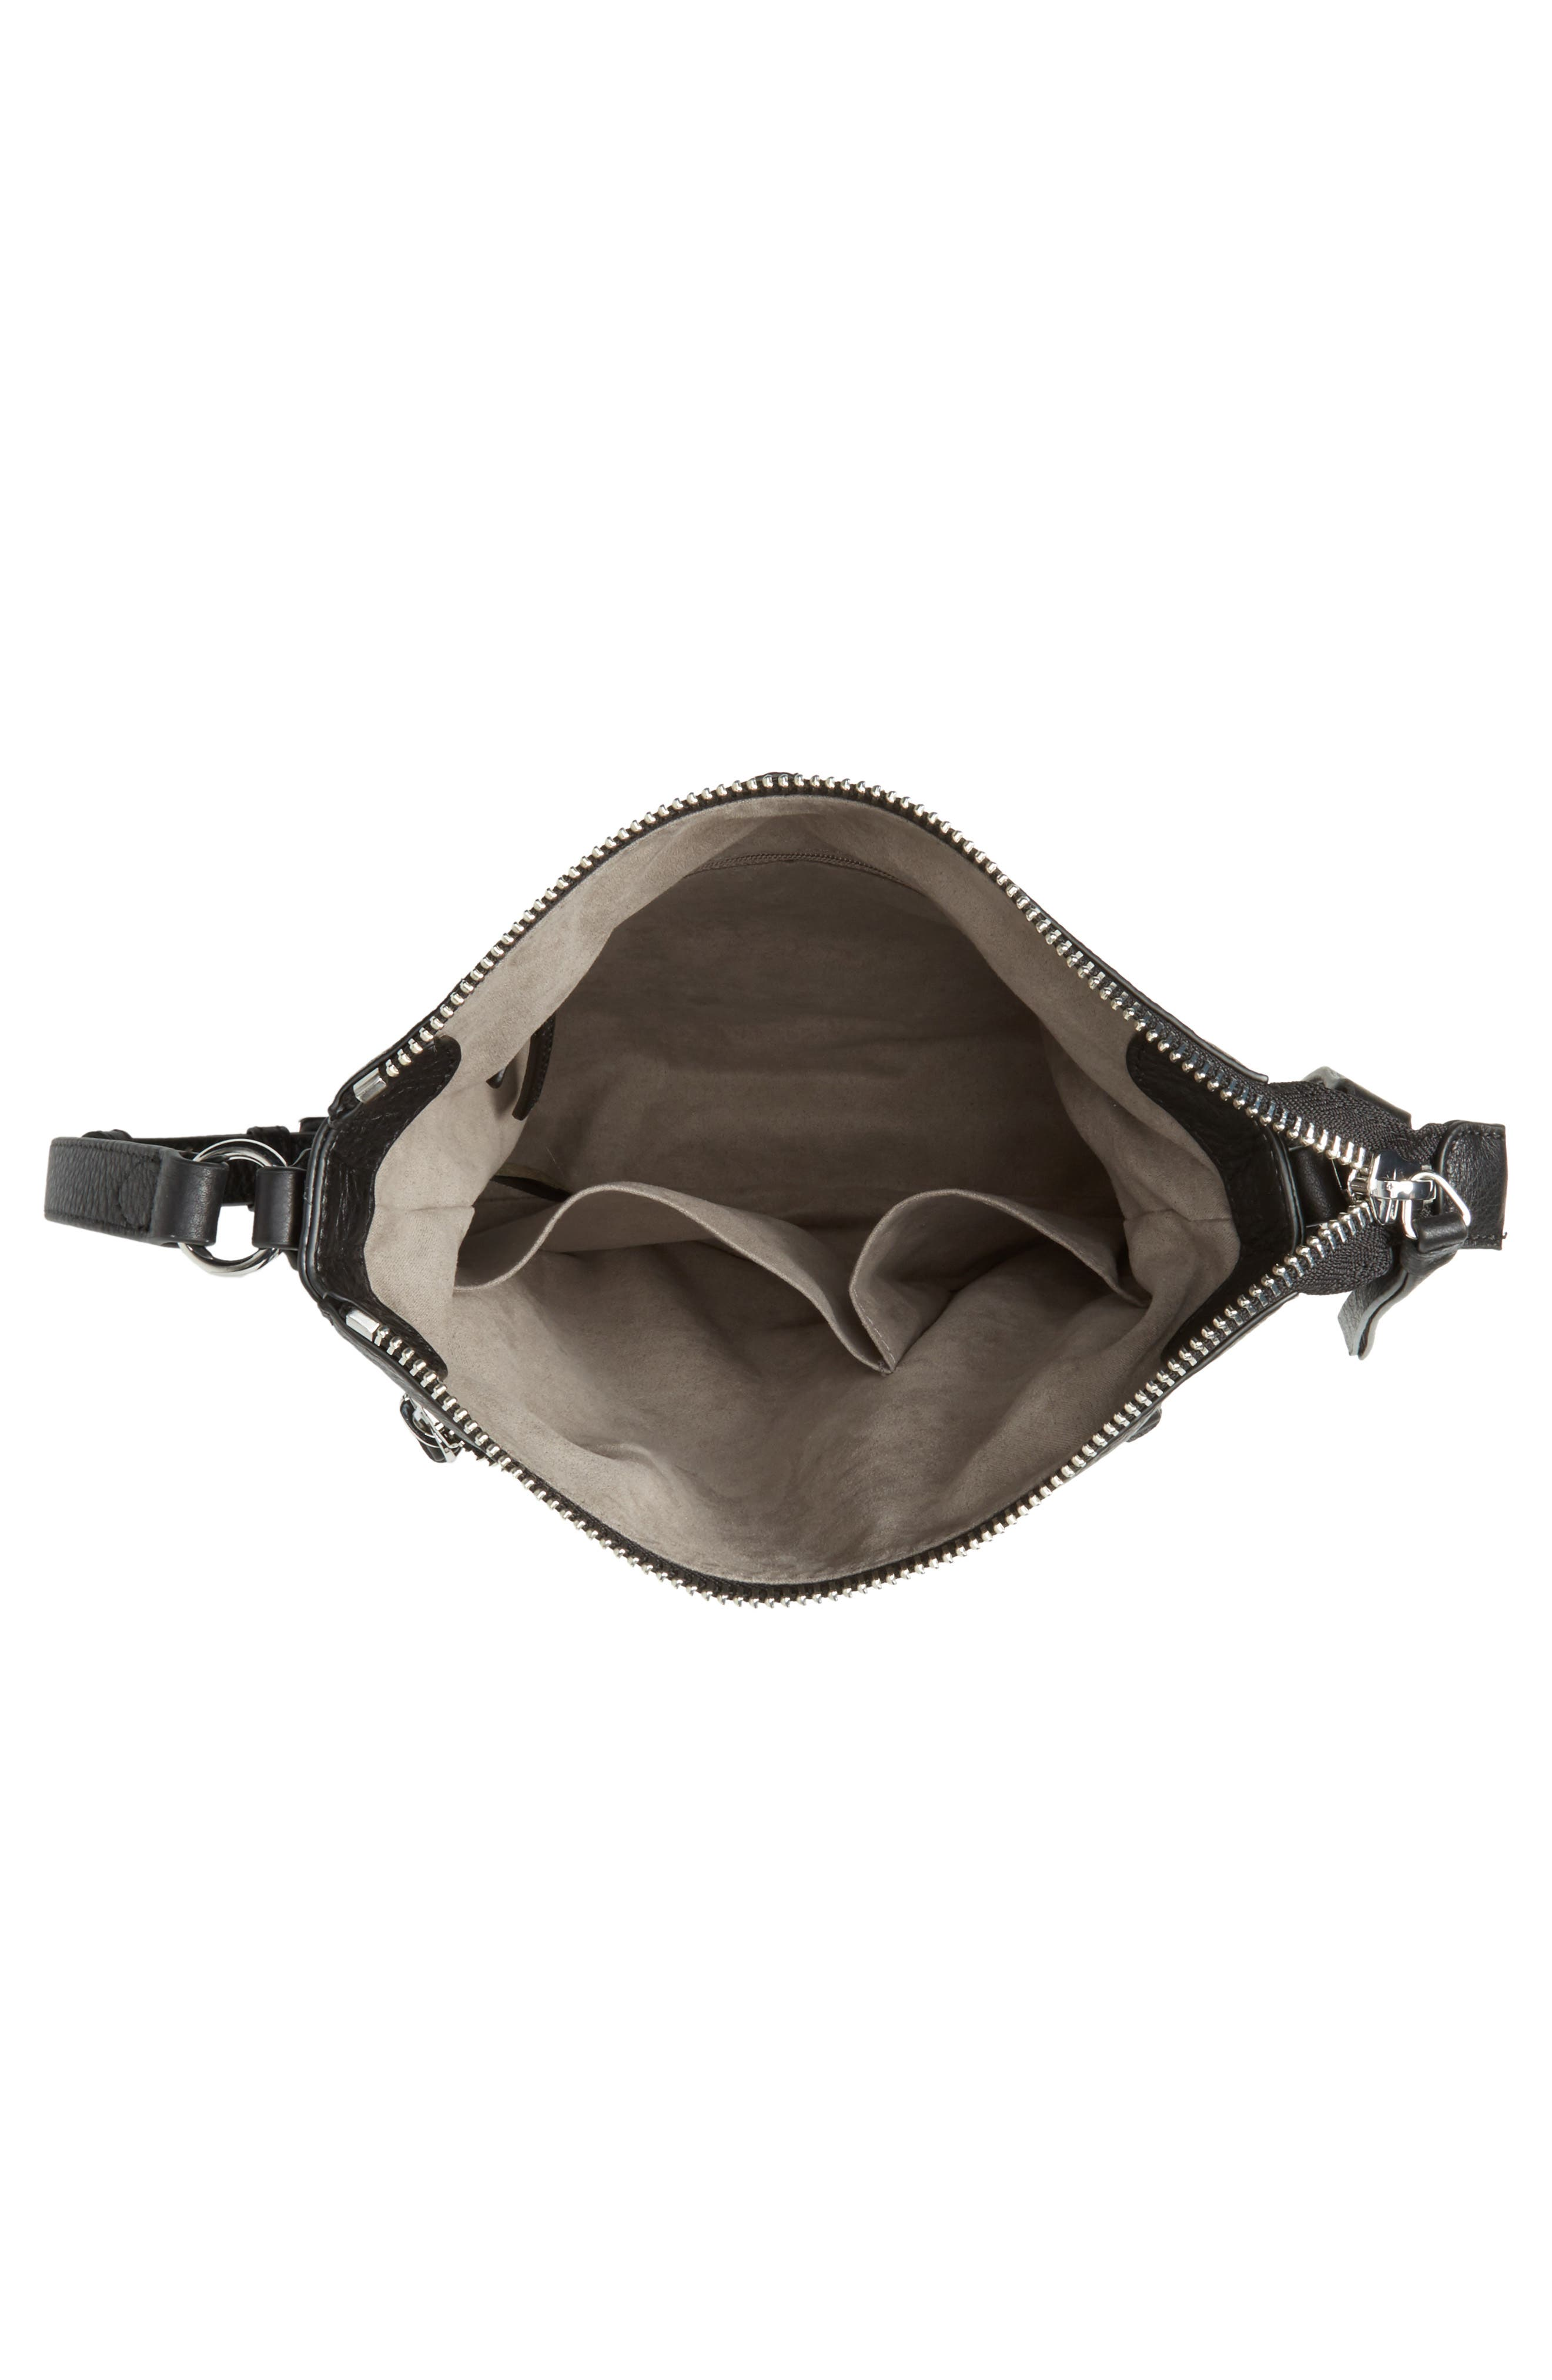 Staja Leather Crossbody Bag,                             Alternate thumbnail 5, color,                             Nero